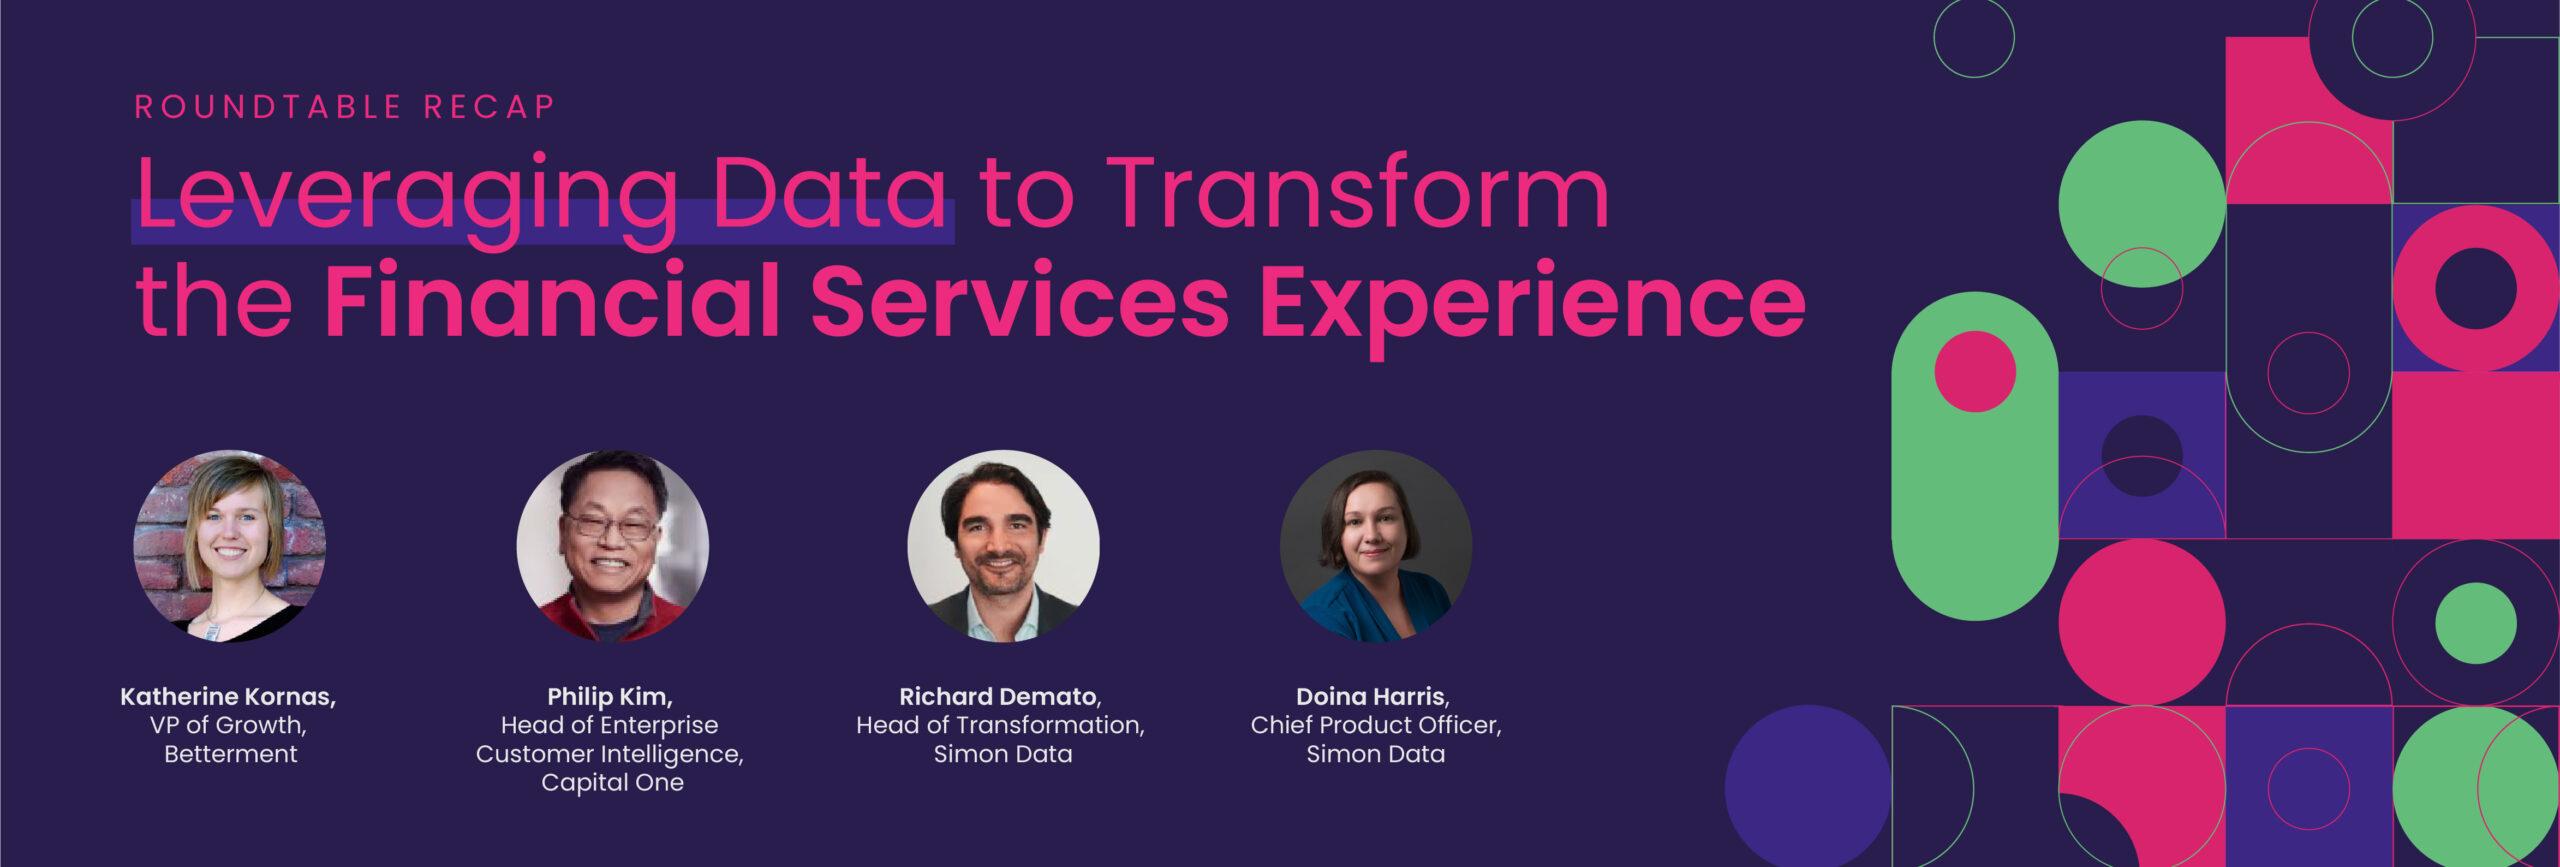 digital transformation financial services